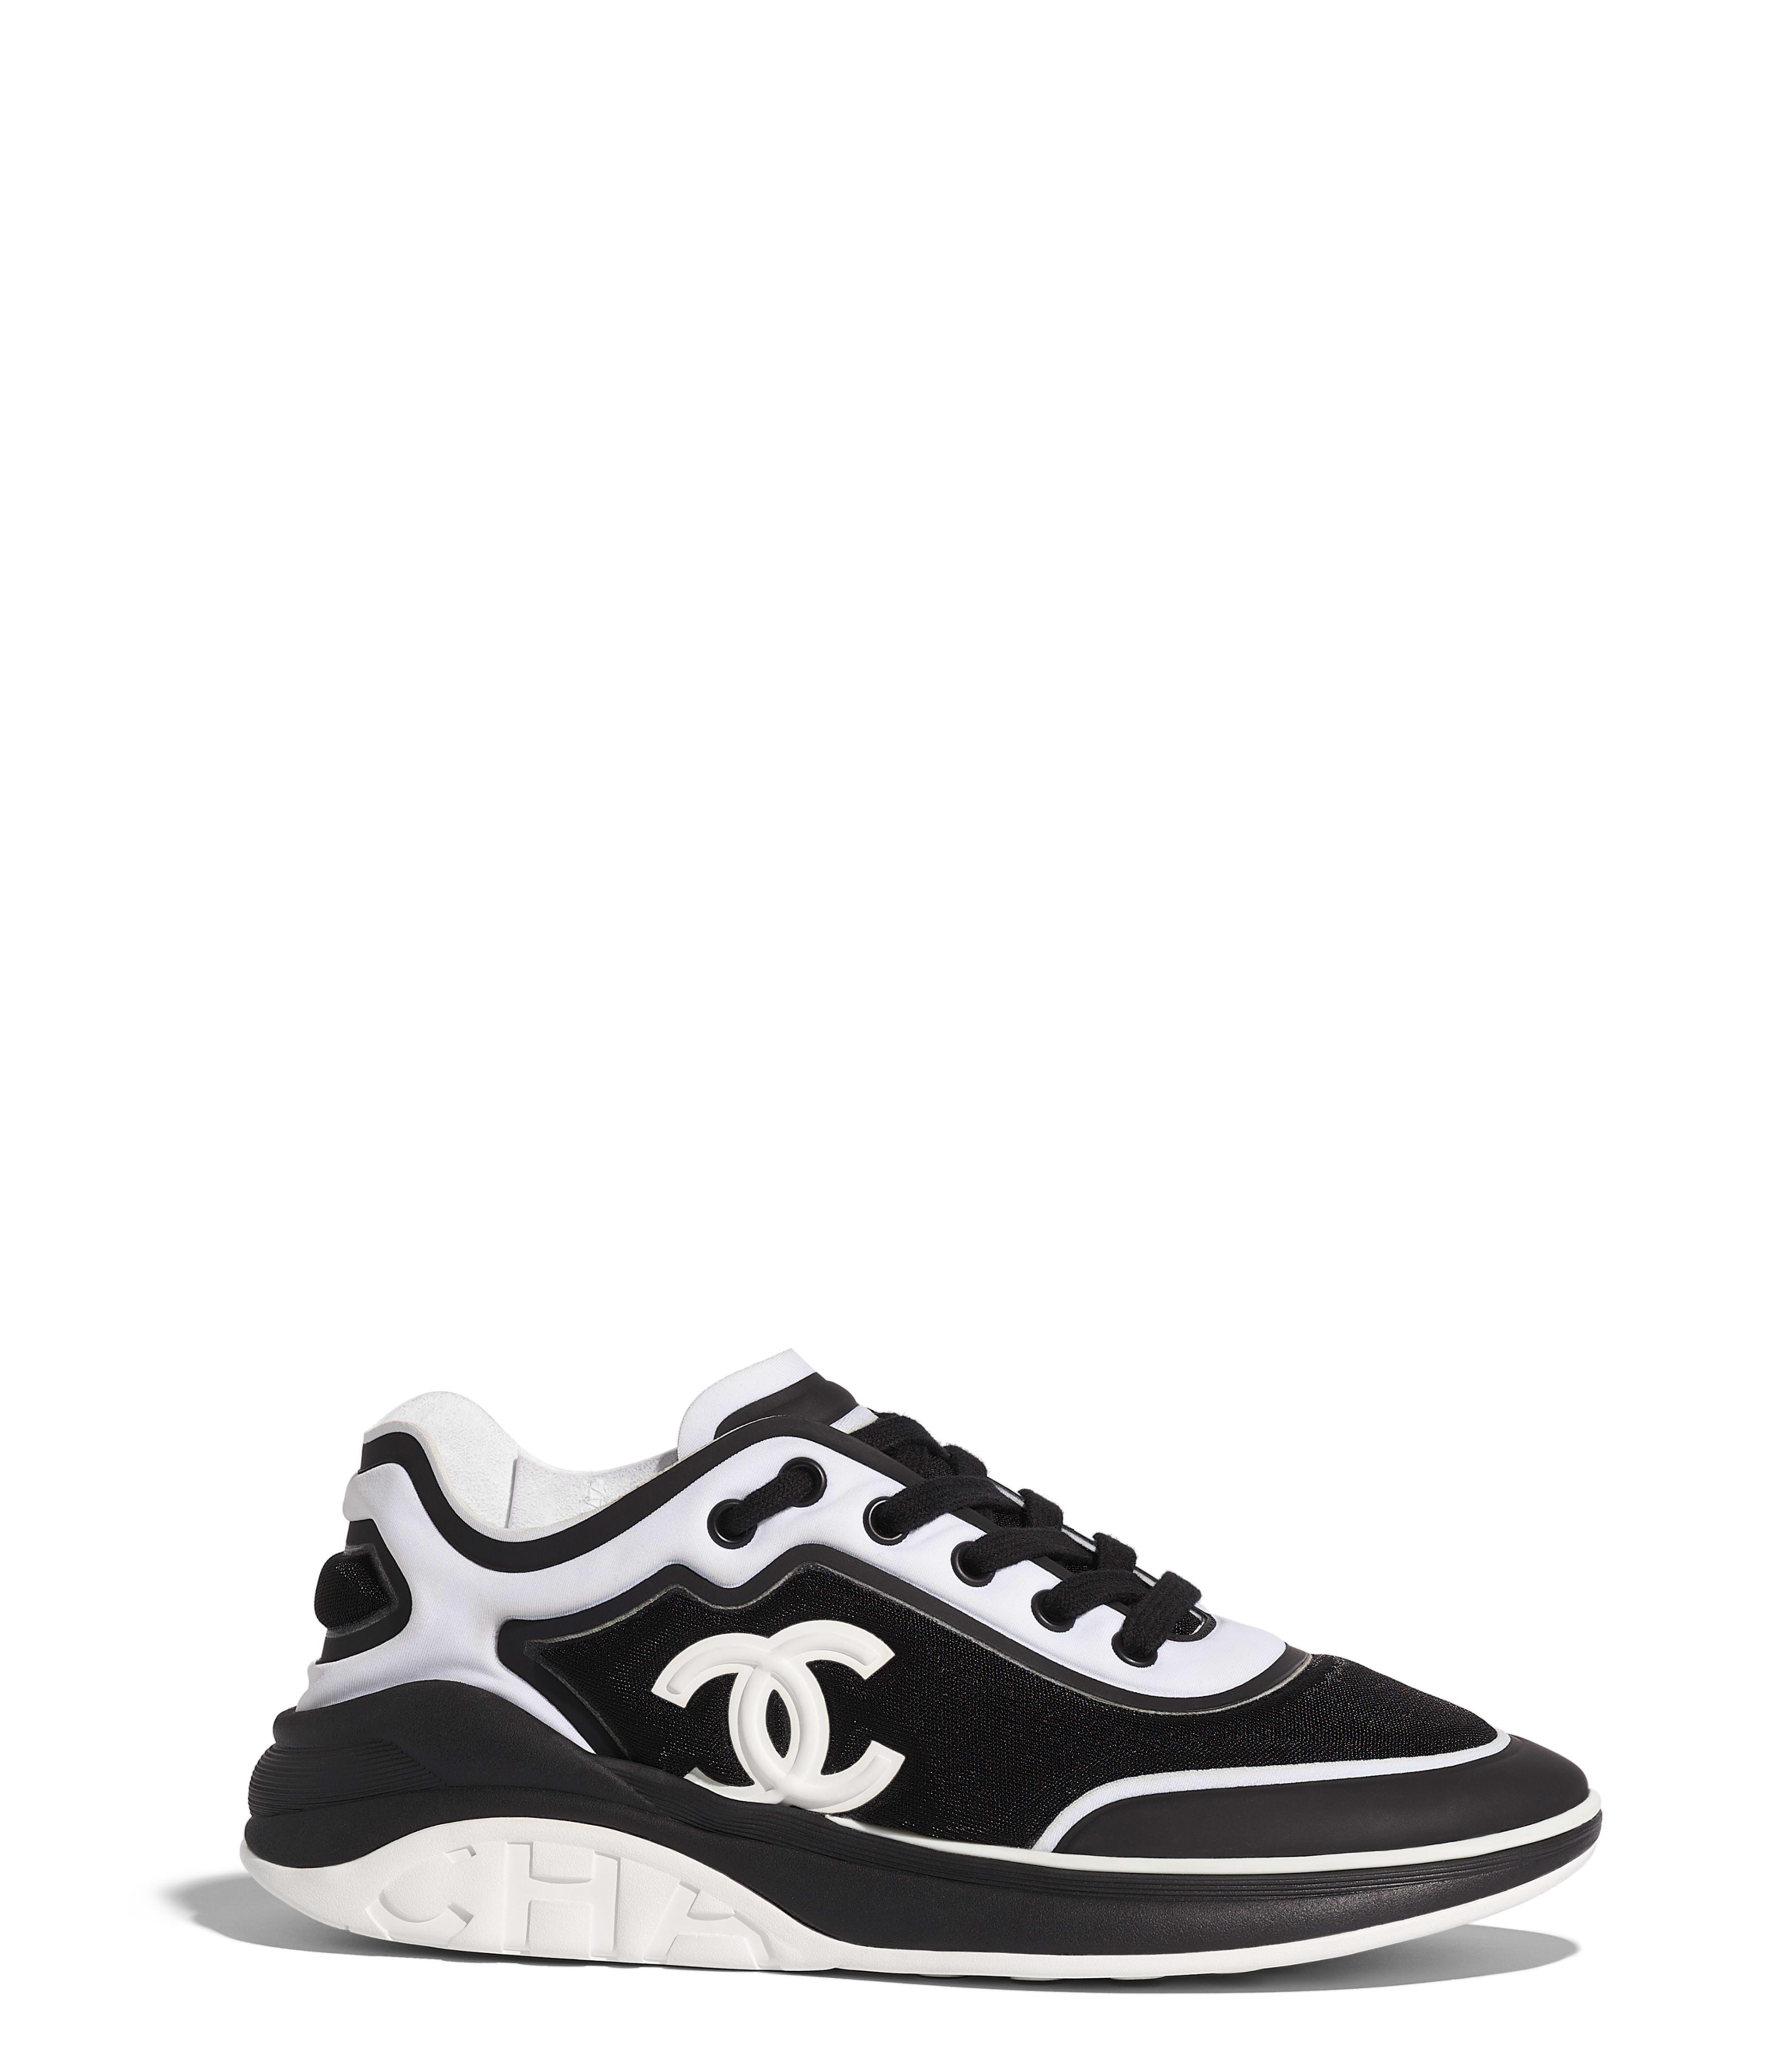 78360eed10c1 Sneakers Mesh   Lycra